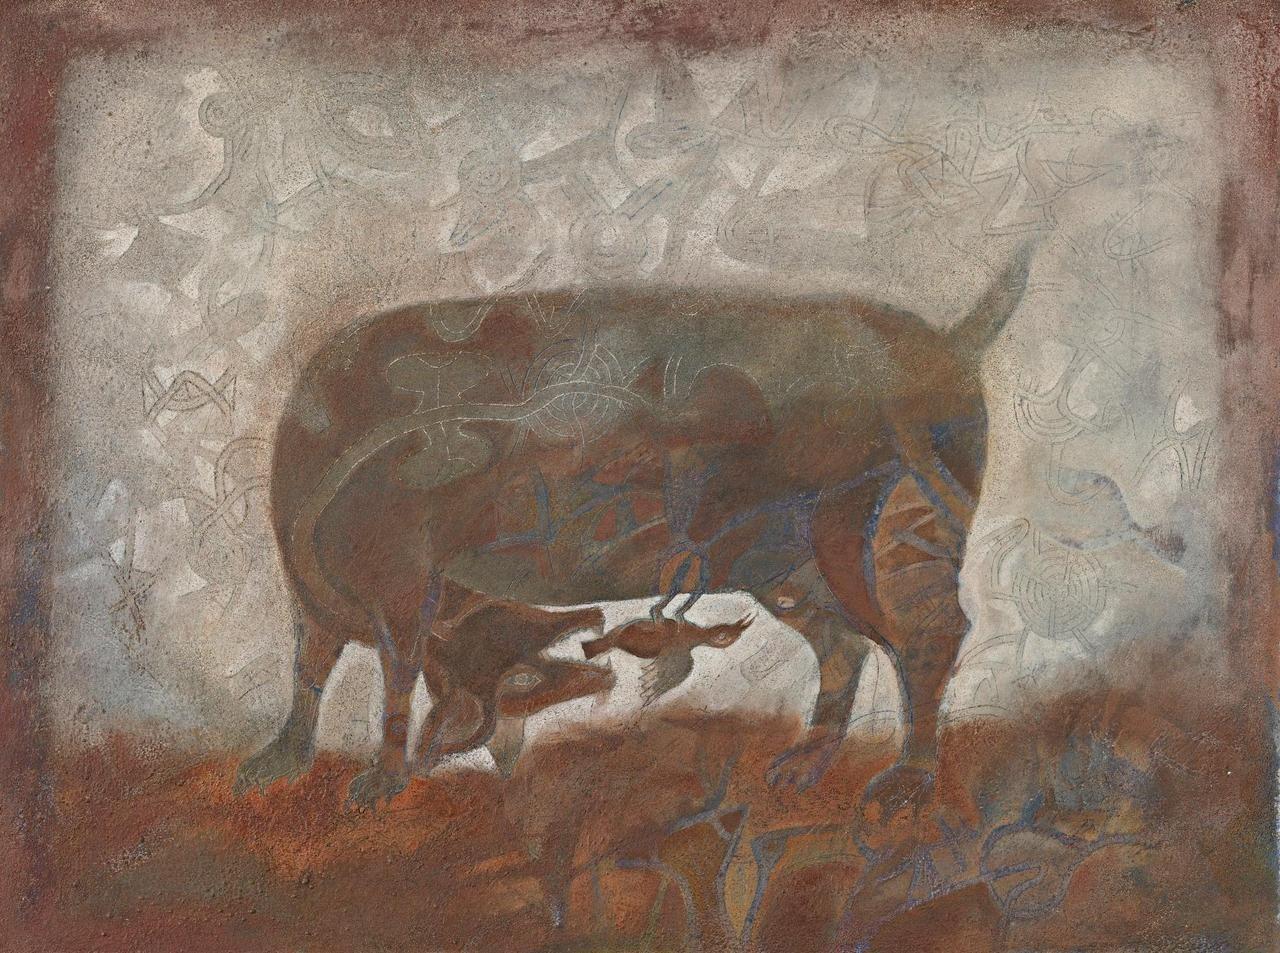 Francisco Toledo Mexican B 1940 El Perro De Colima Oil And Sand On Canvas 60 30 X 79 60 Cm 1975 Latin American Art American Art Surreal Art